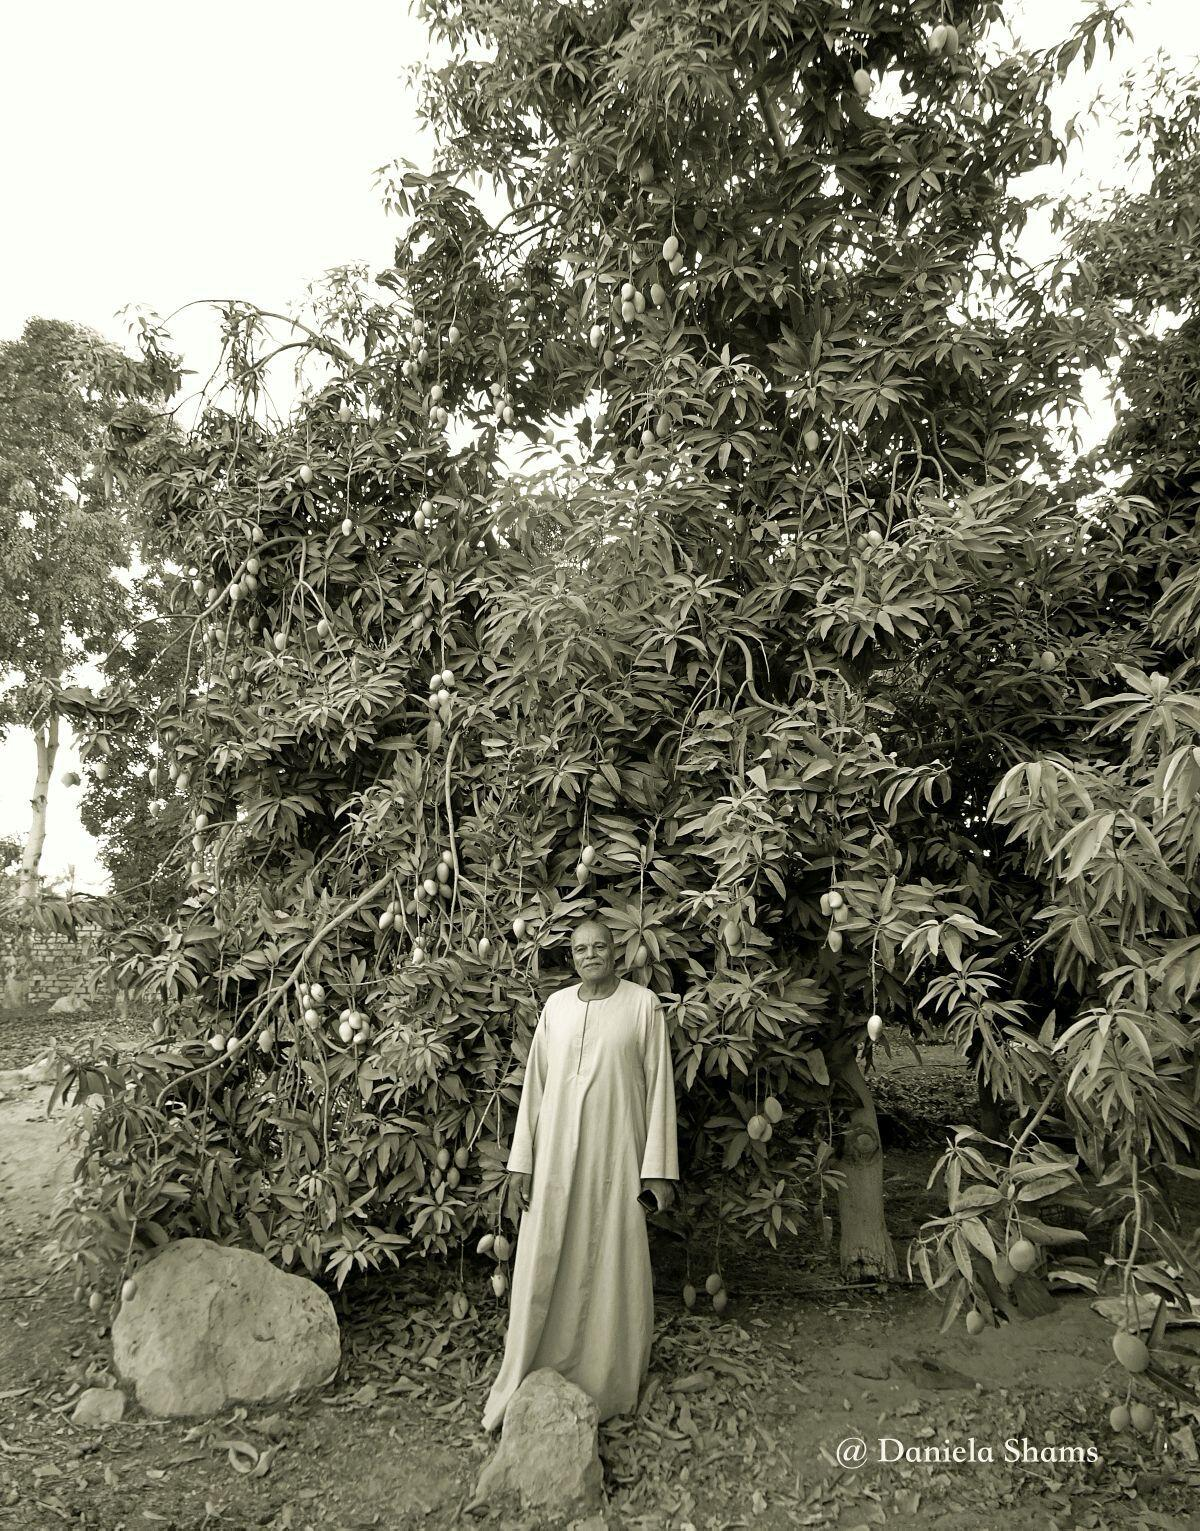 Ägypten, mangofarm, auf dem land, Reportage